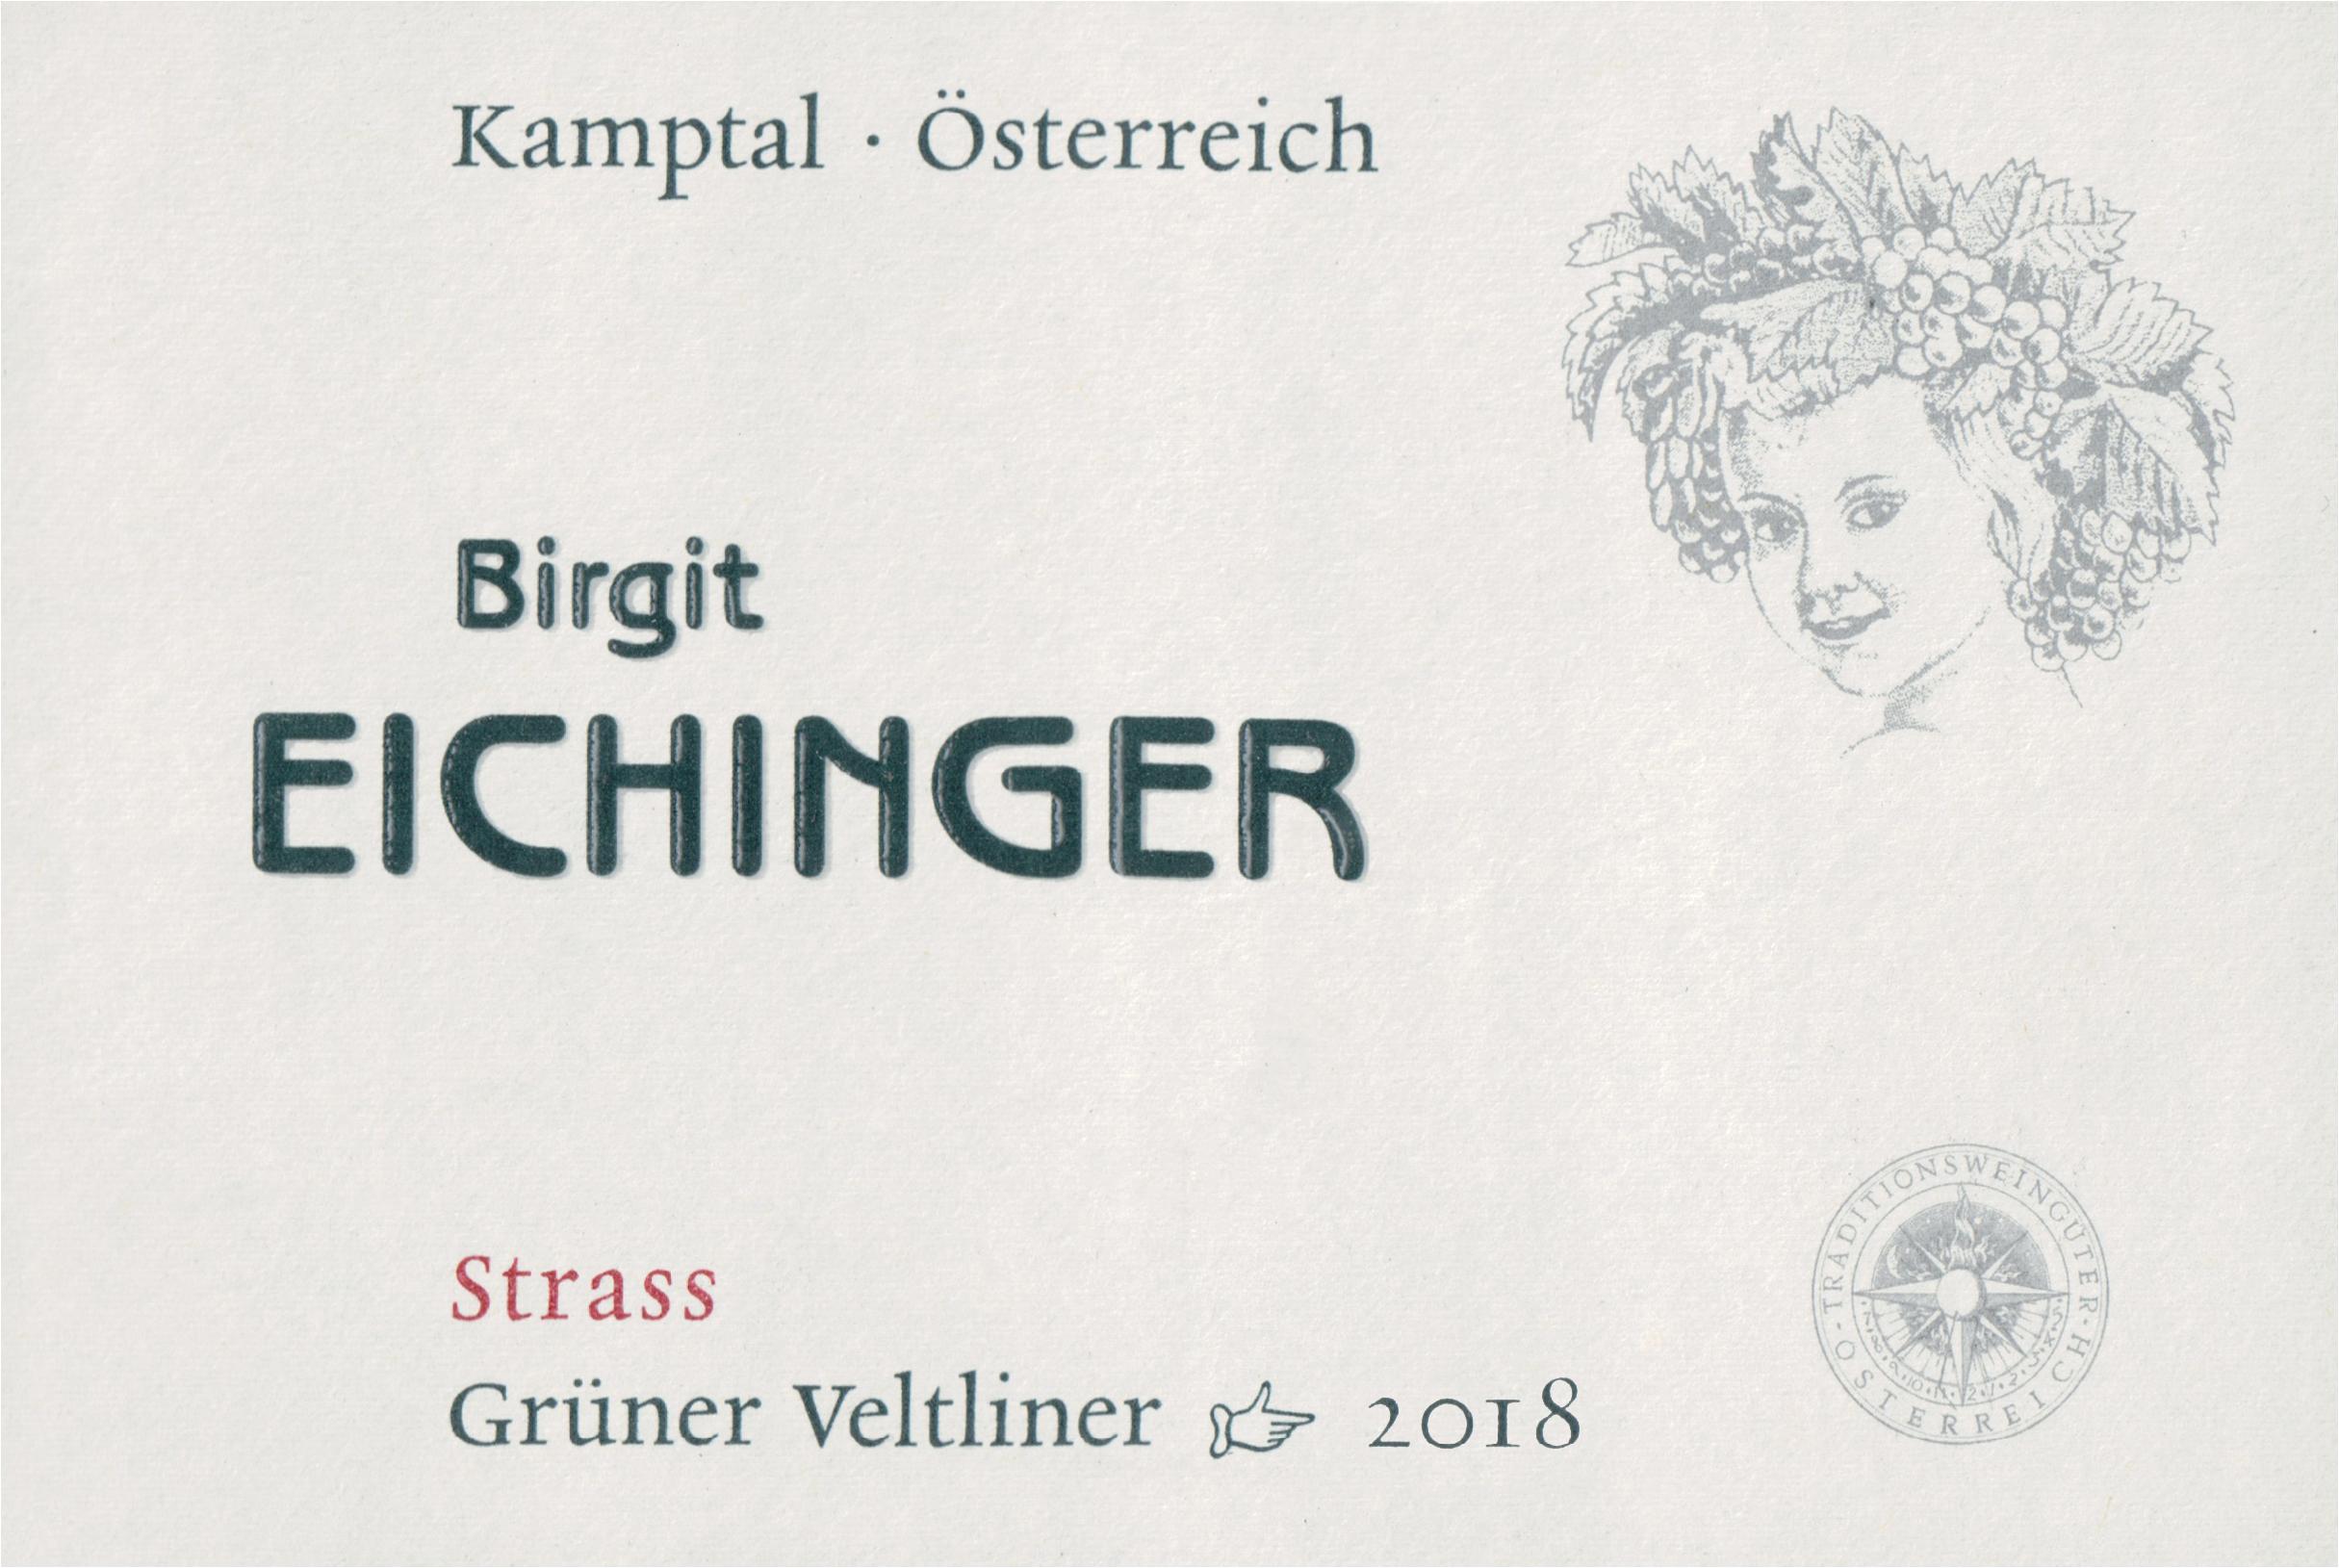 Birgit Eichinger Gruner Veltliner Strass 2018